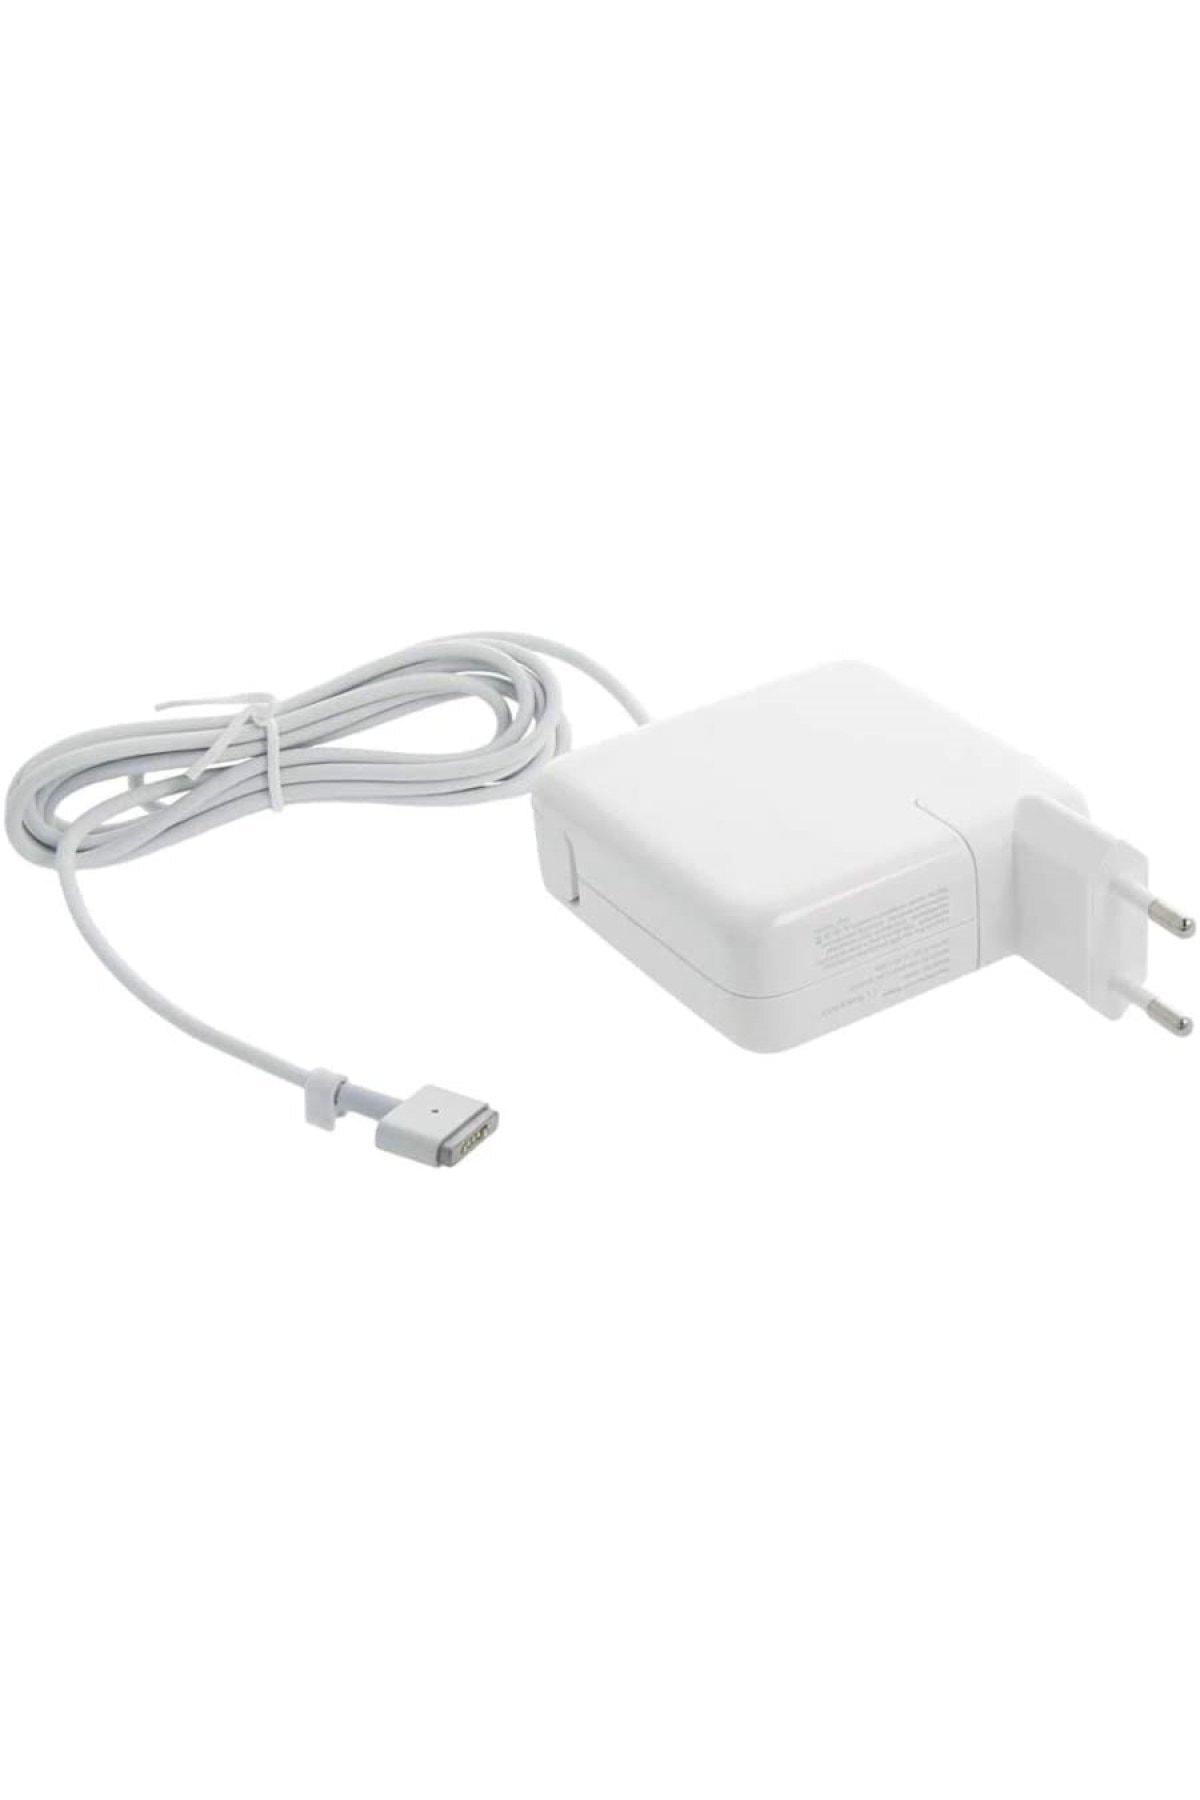 İnfomax Apple Macbook Air A1346, A1436, A1465, A1466 Adaptör Şarj Aleti 2